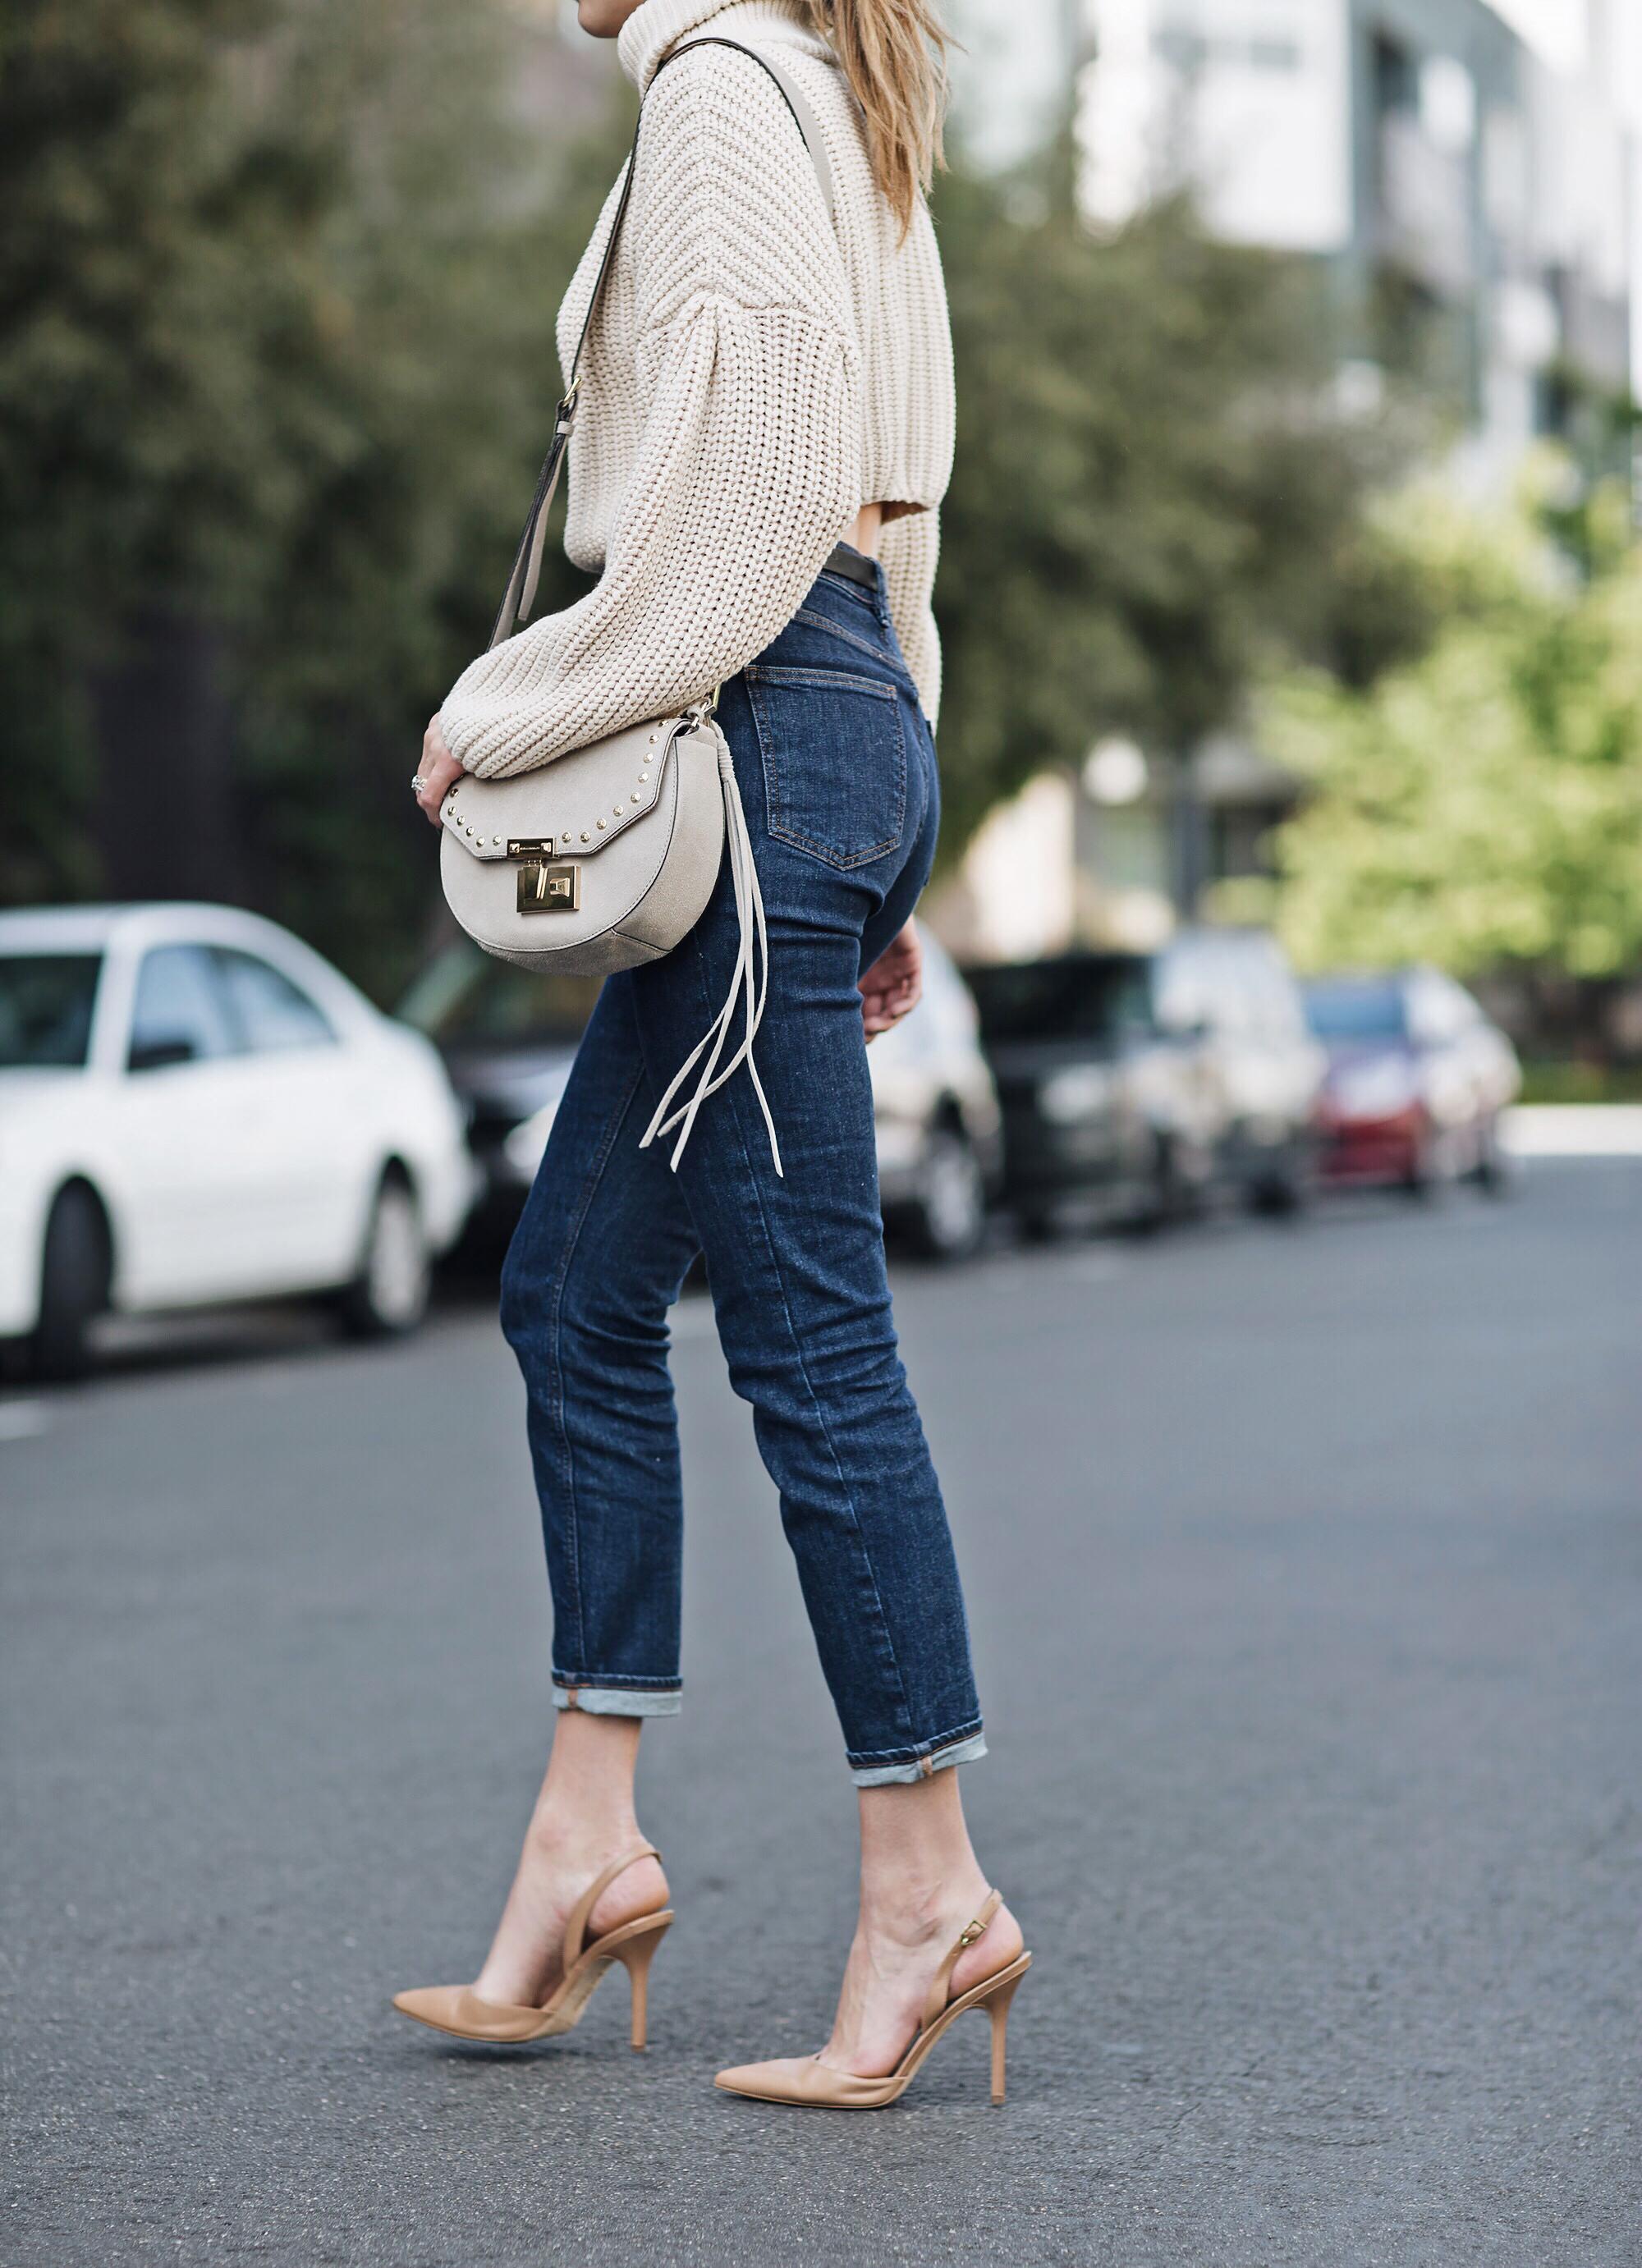 High Waisted Mom Jeans Sling Back Heels